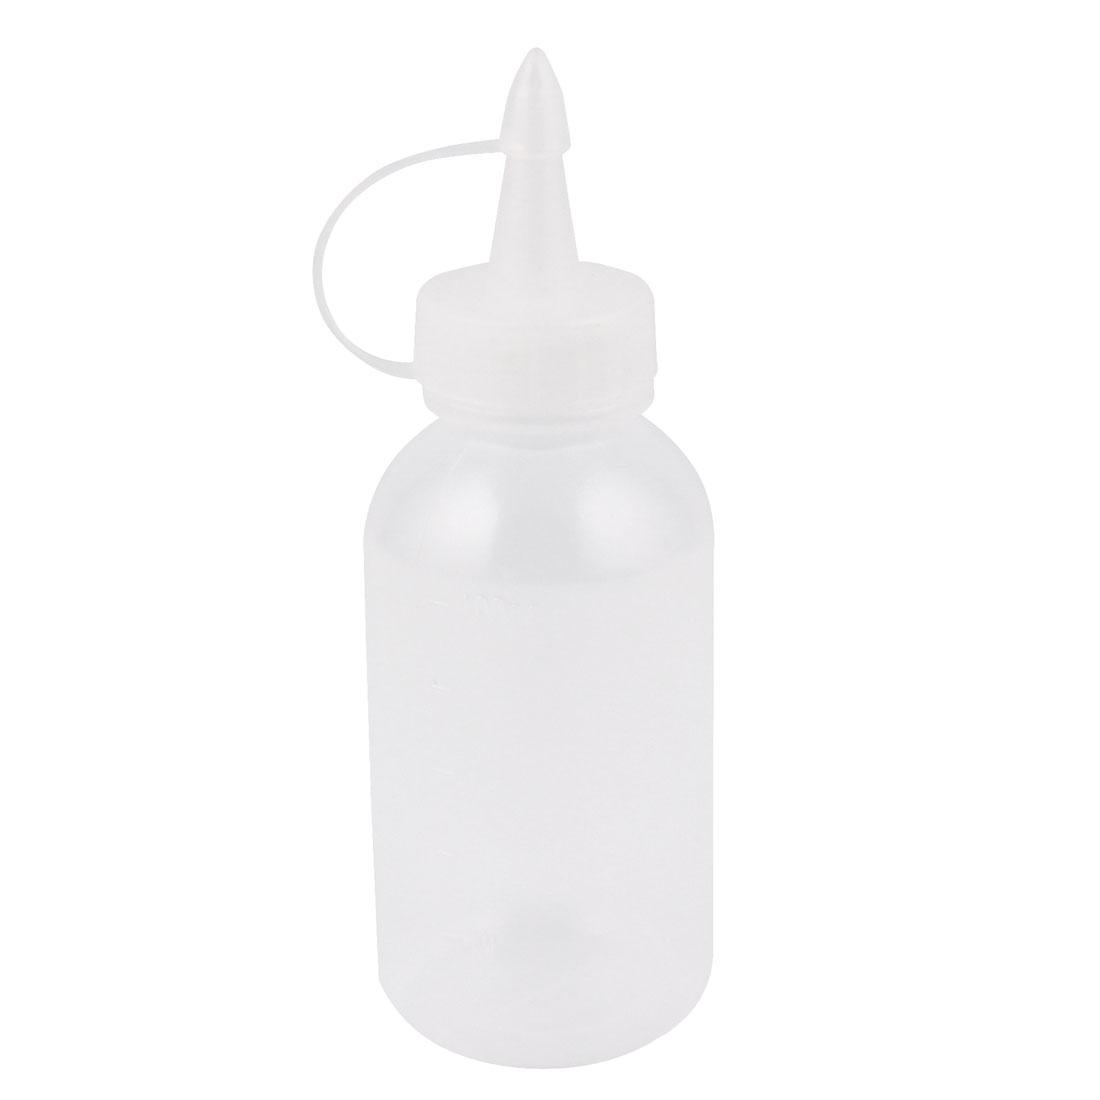 100ml Industrial Clear Plastic Glue Gel Oil Squeeze Bottle Dispenser 5pcs